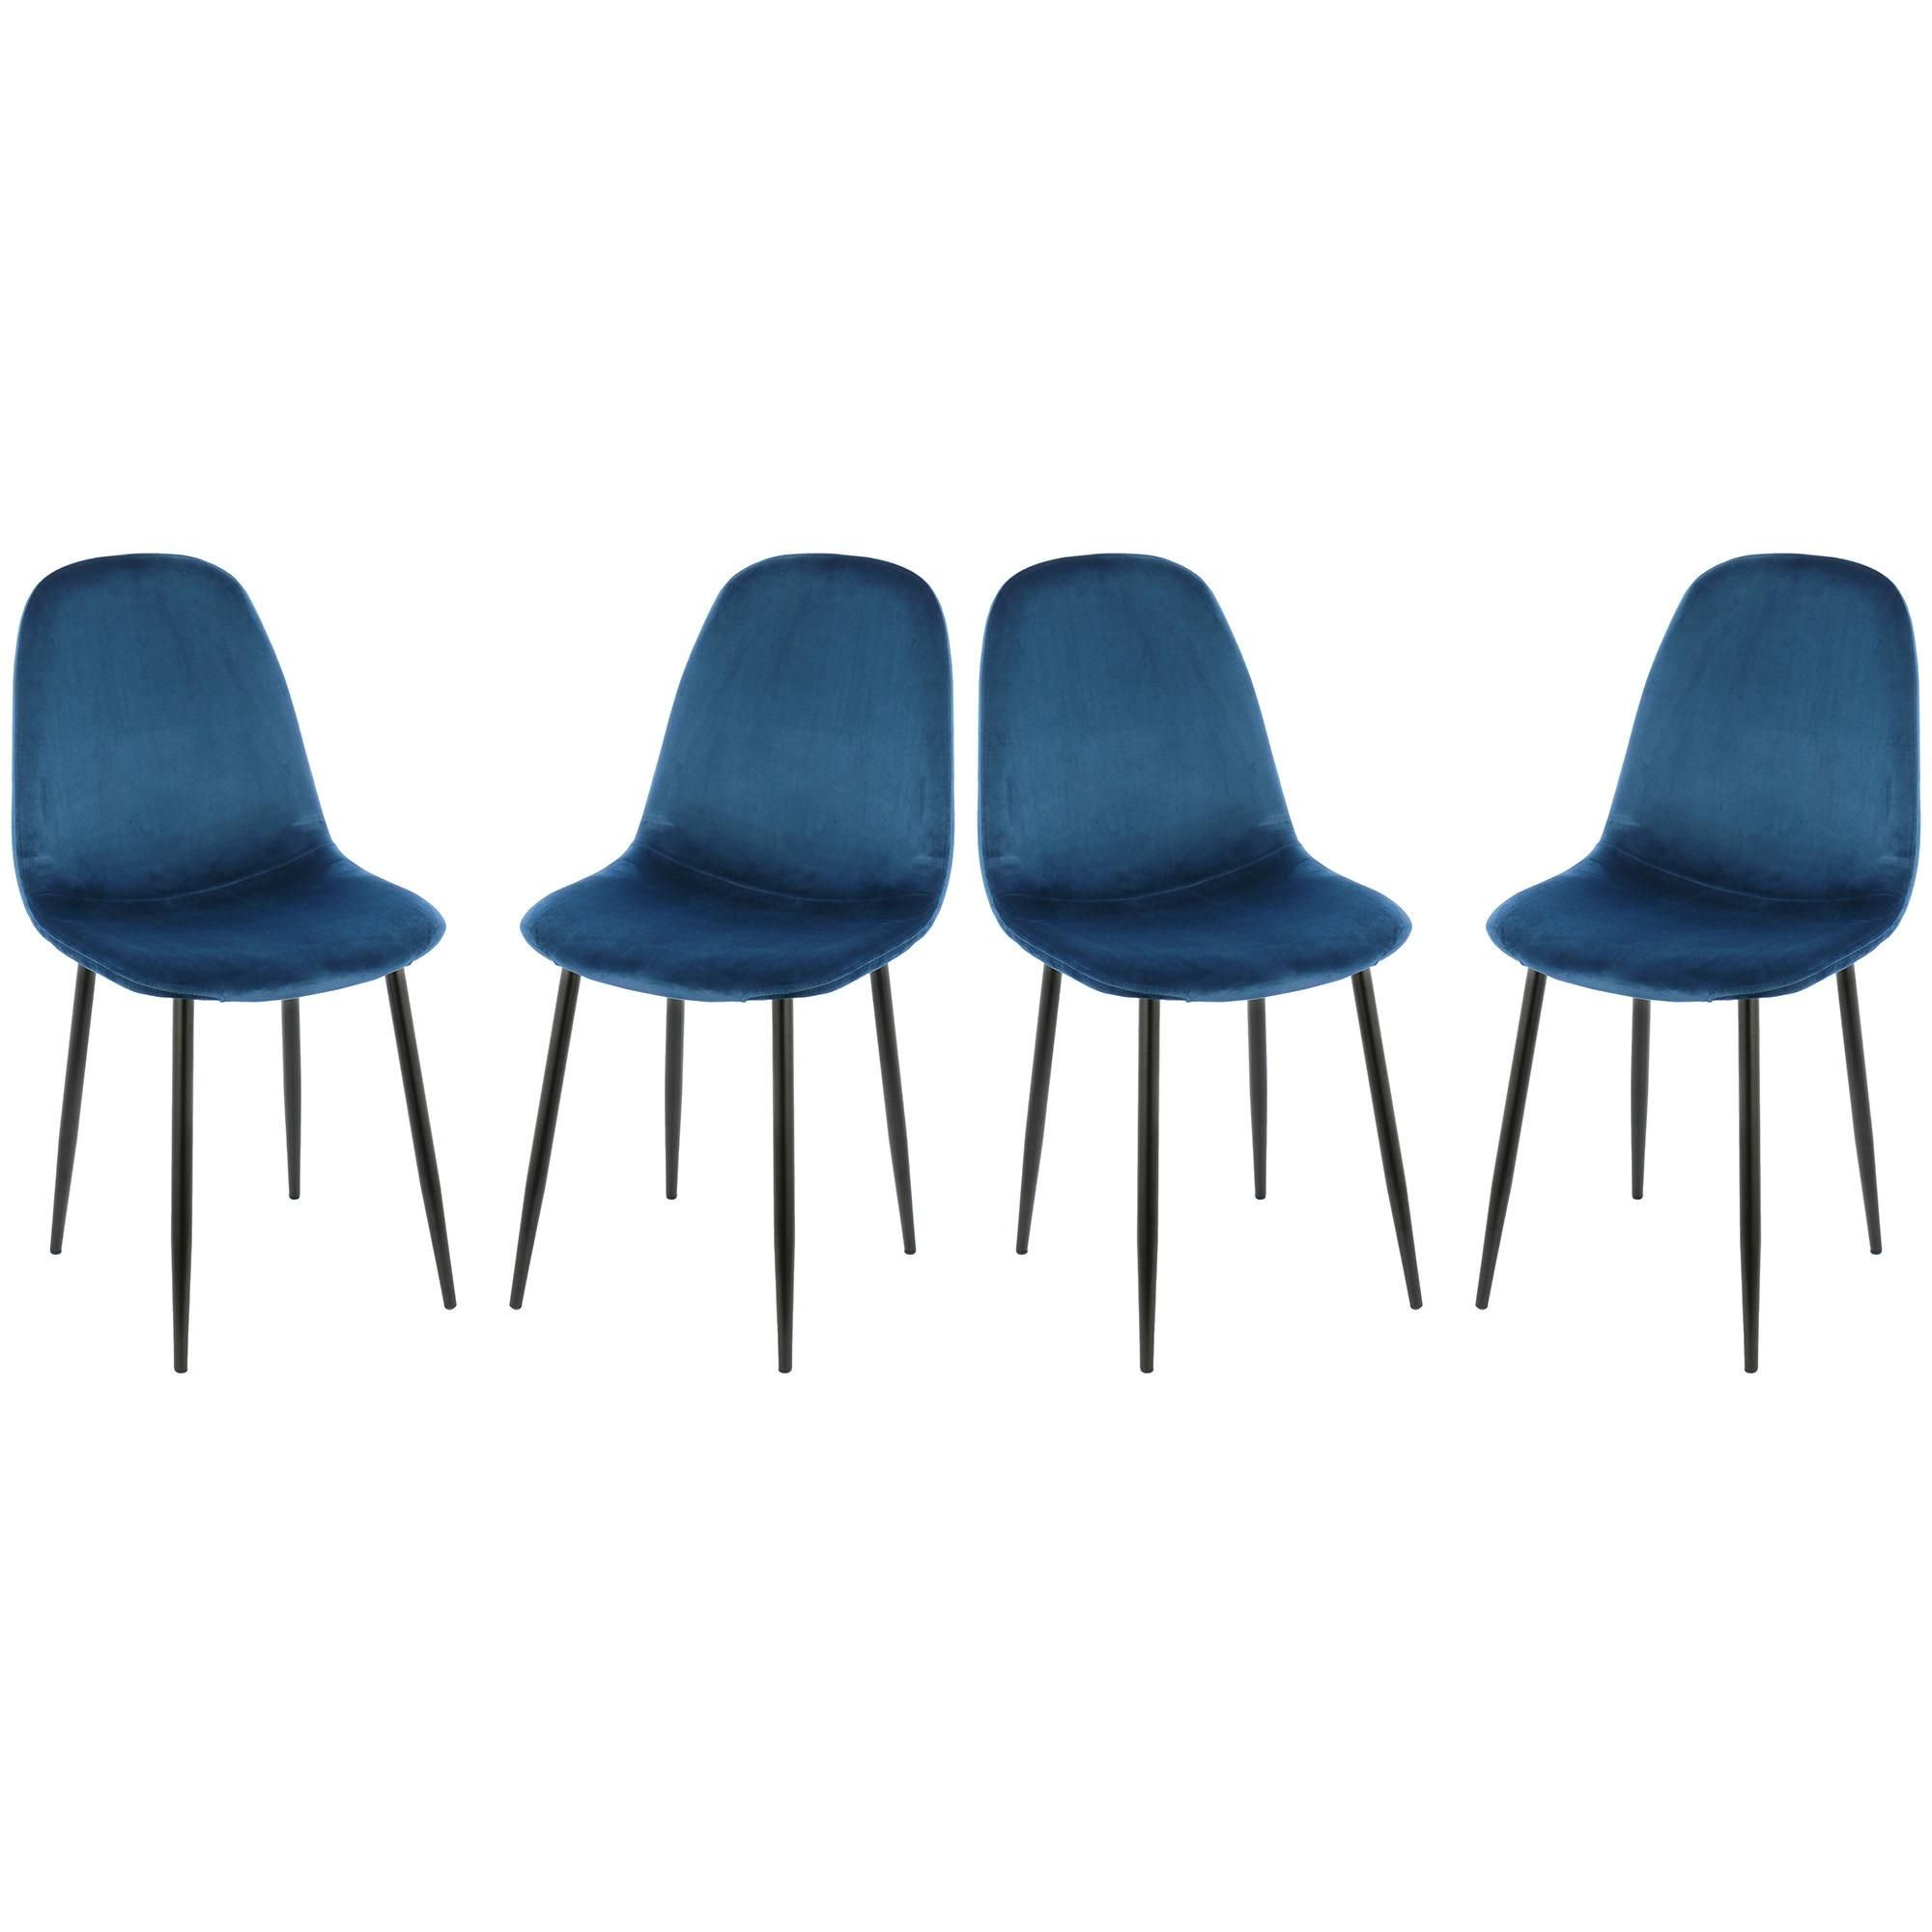 Fotografie Set 4 scaune Kring Miles, material textil, Albastru Royal